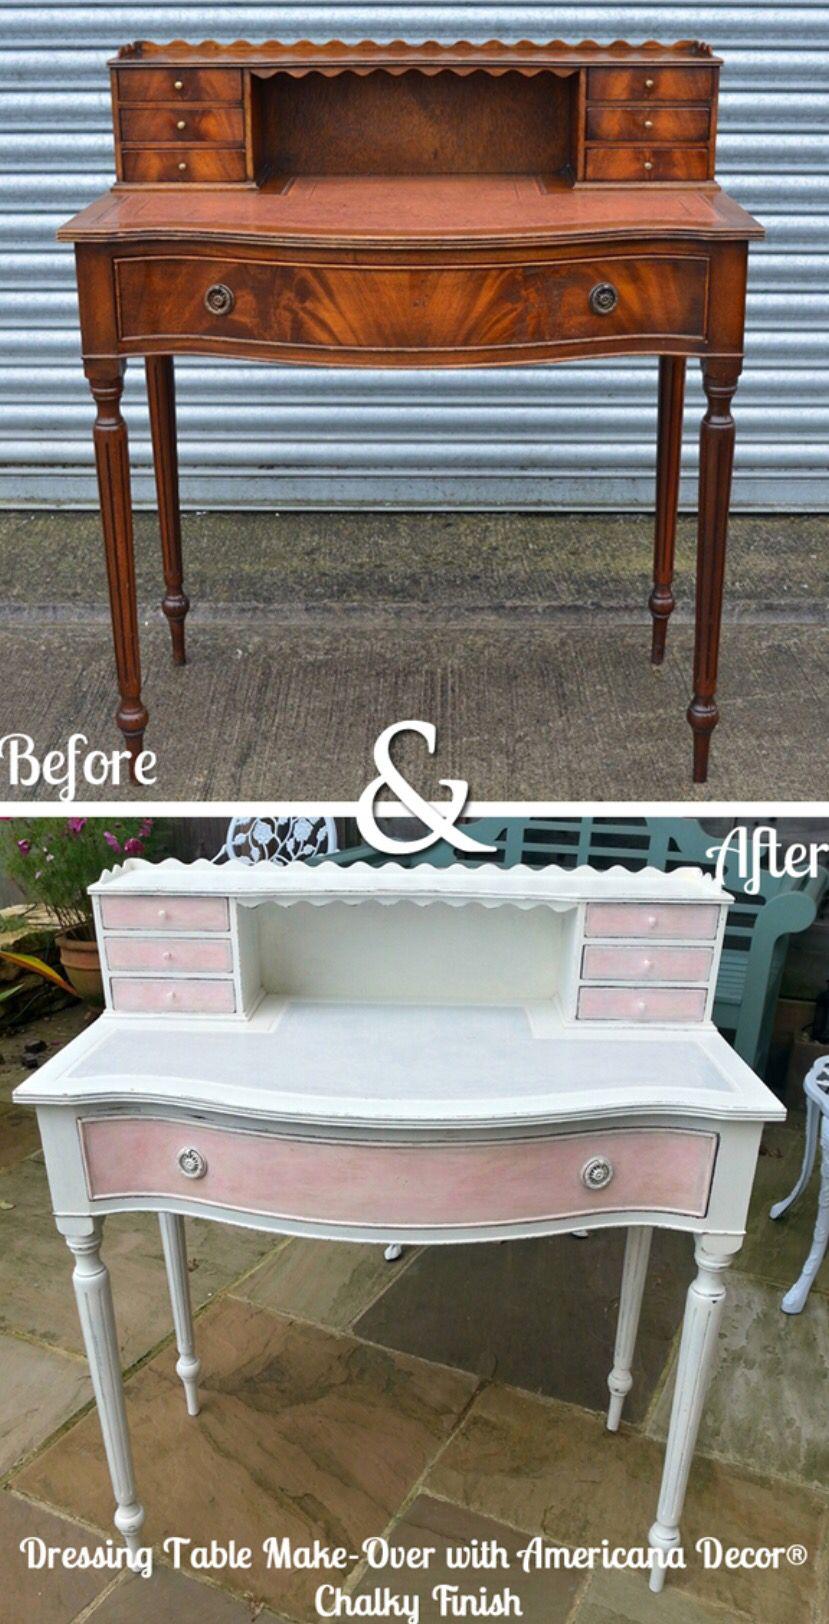 Before before u after antes y después pinterest dresser